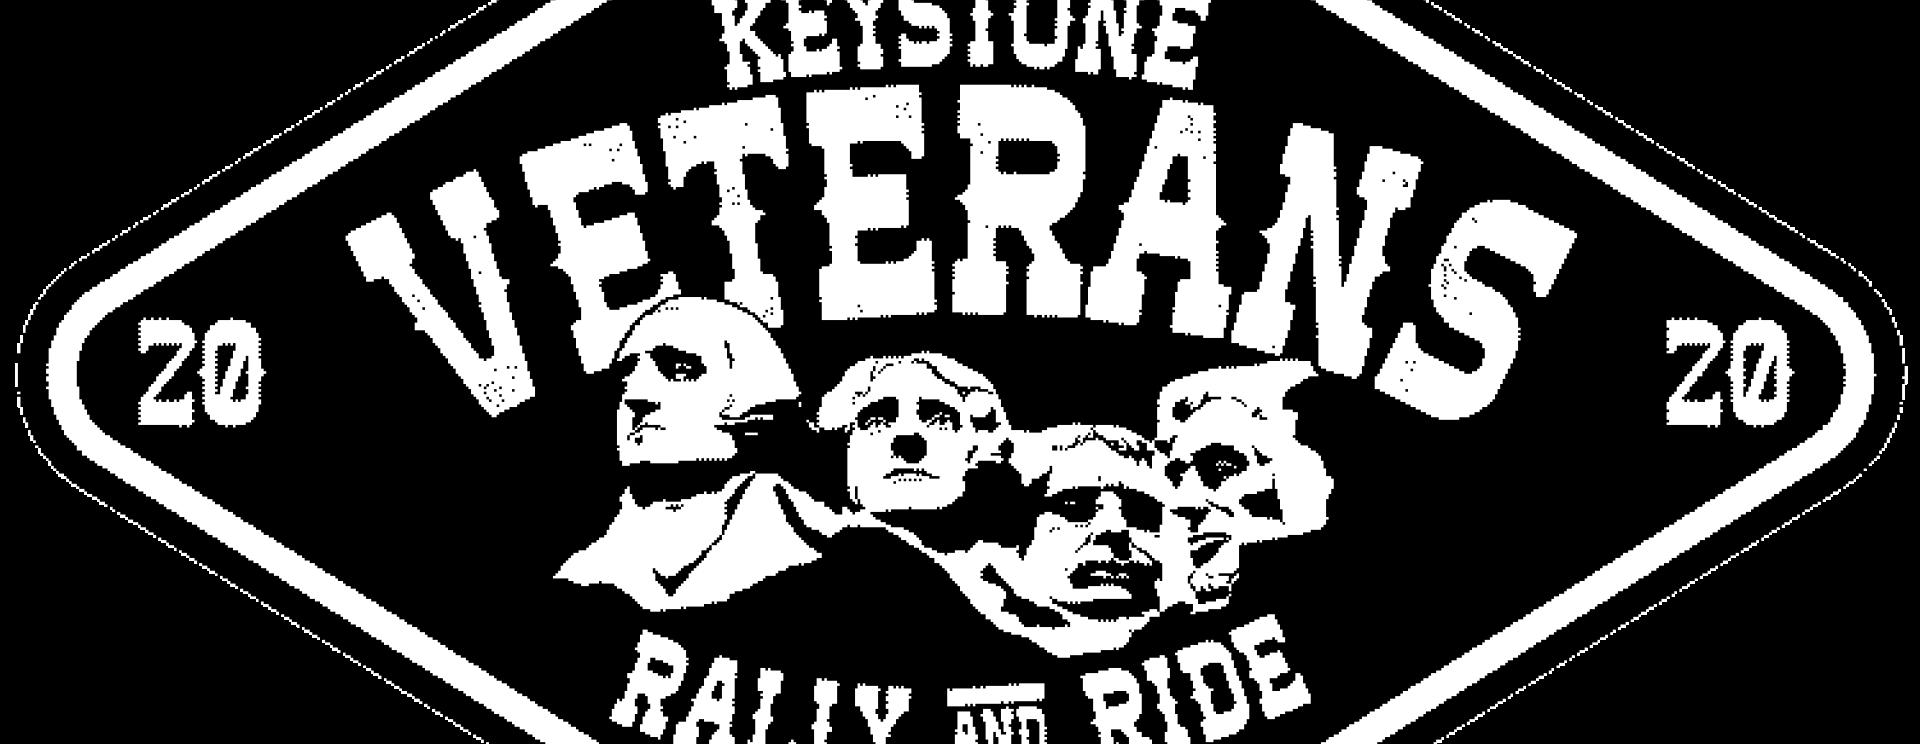 Keystone Veterans Rally and Ride